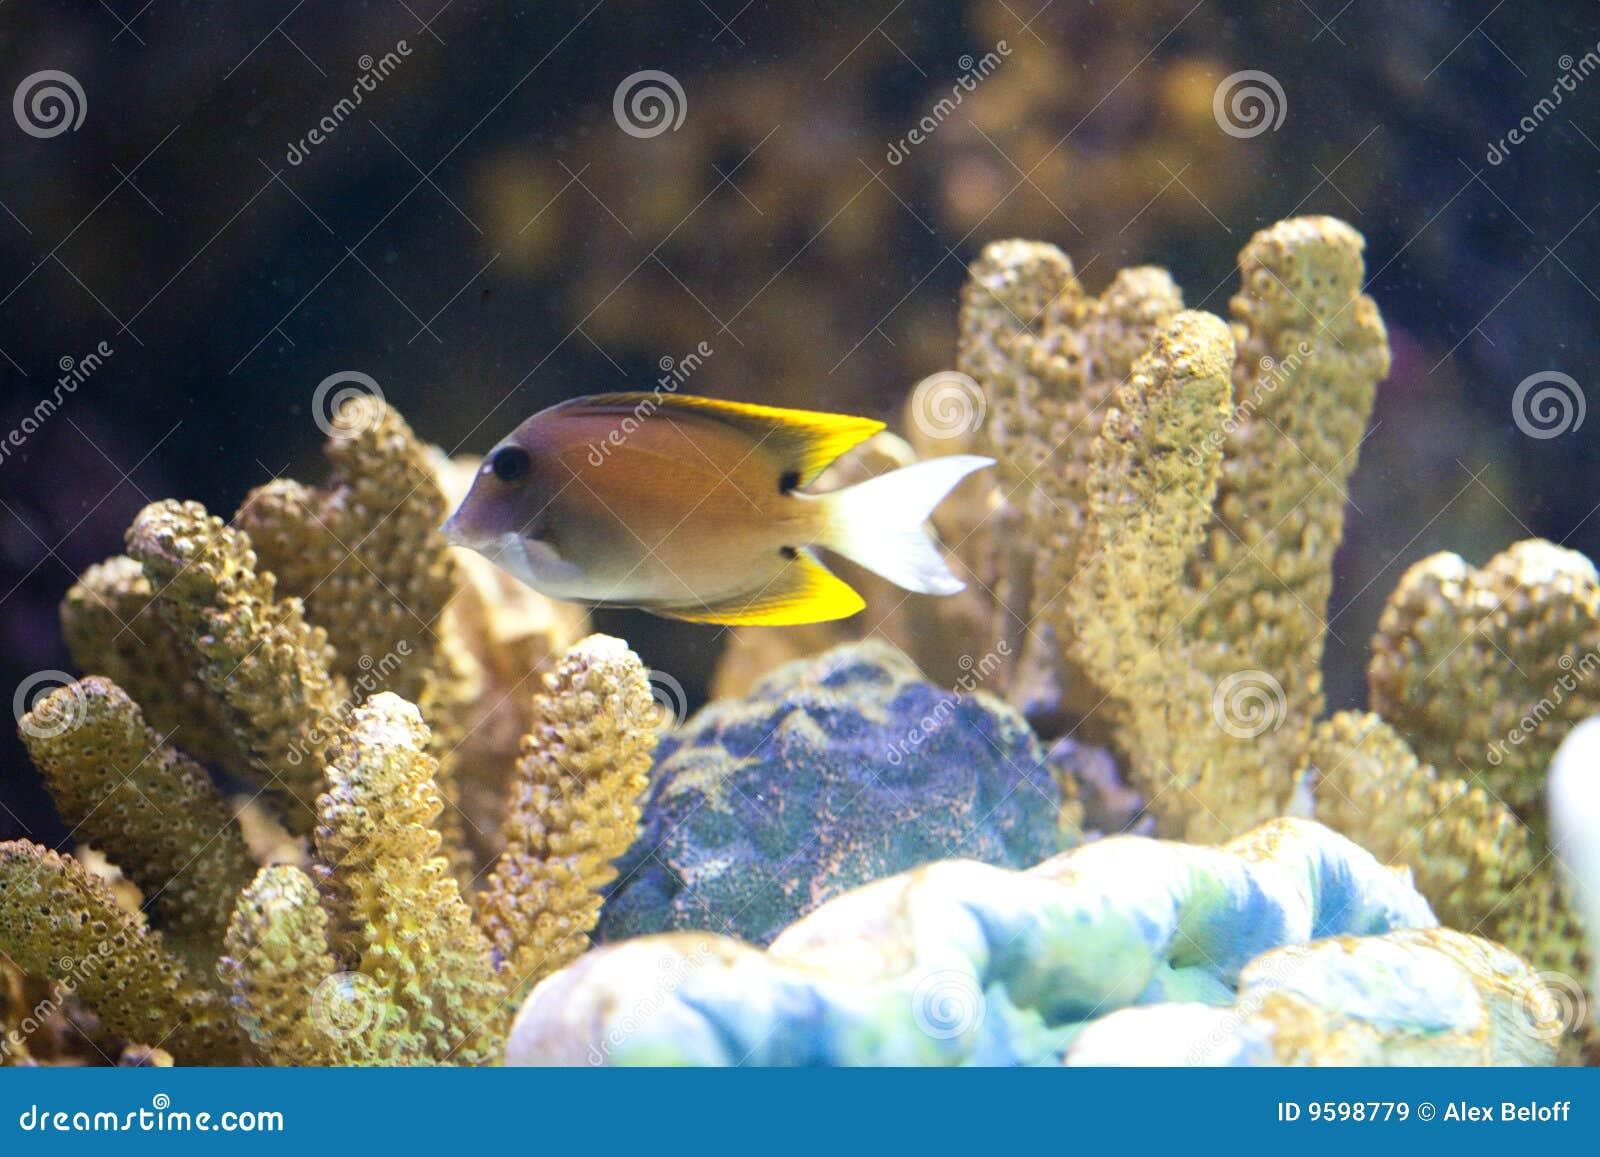 Exotic fish in tank